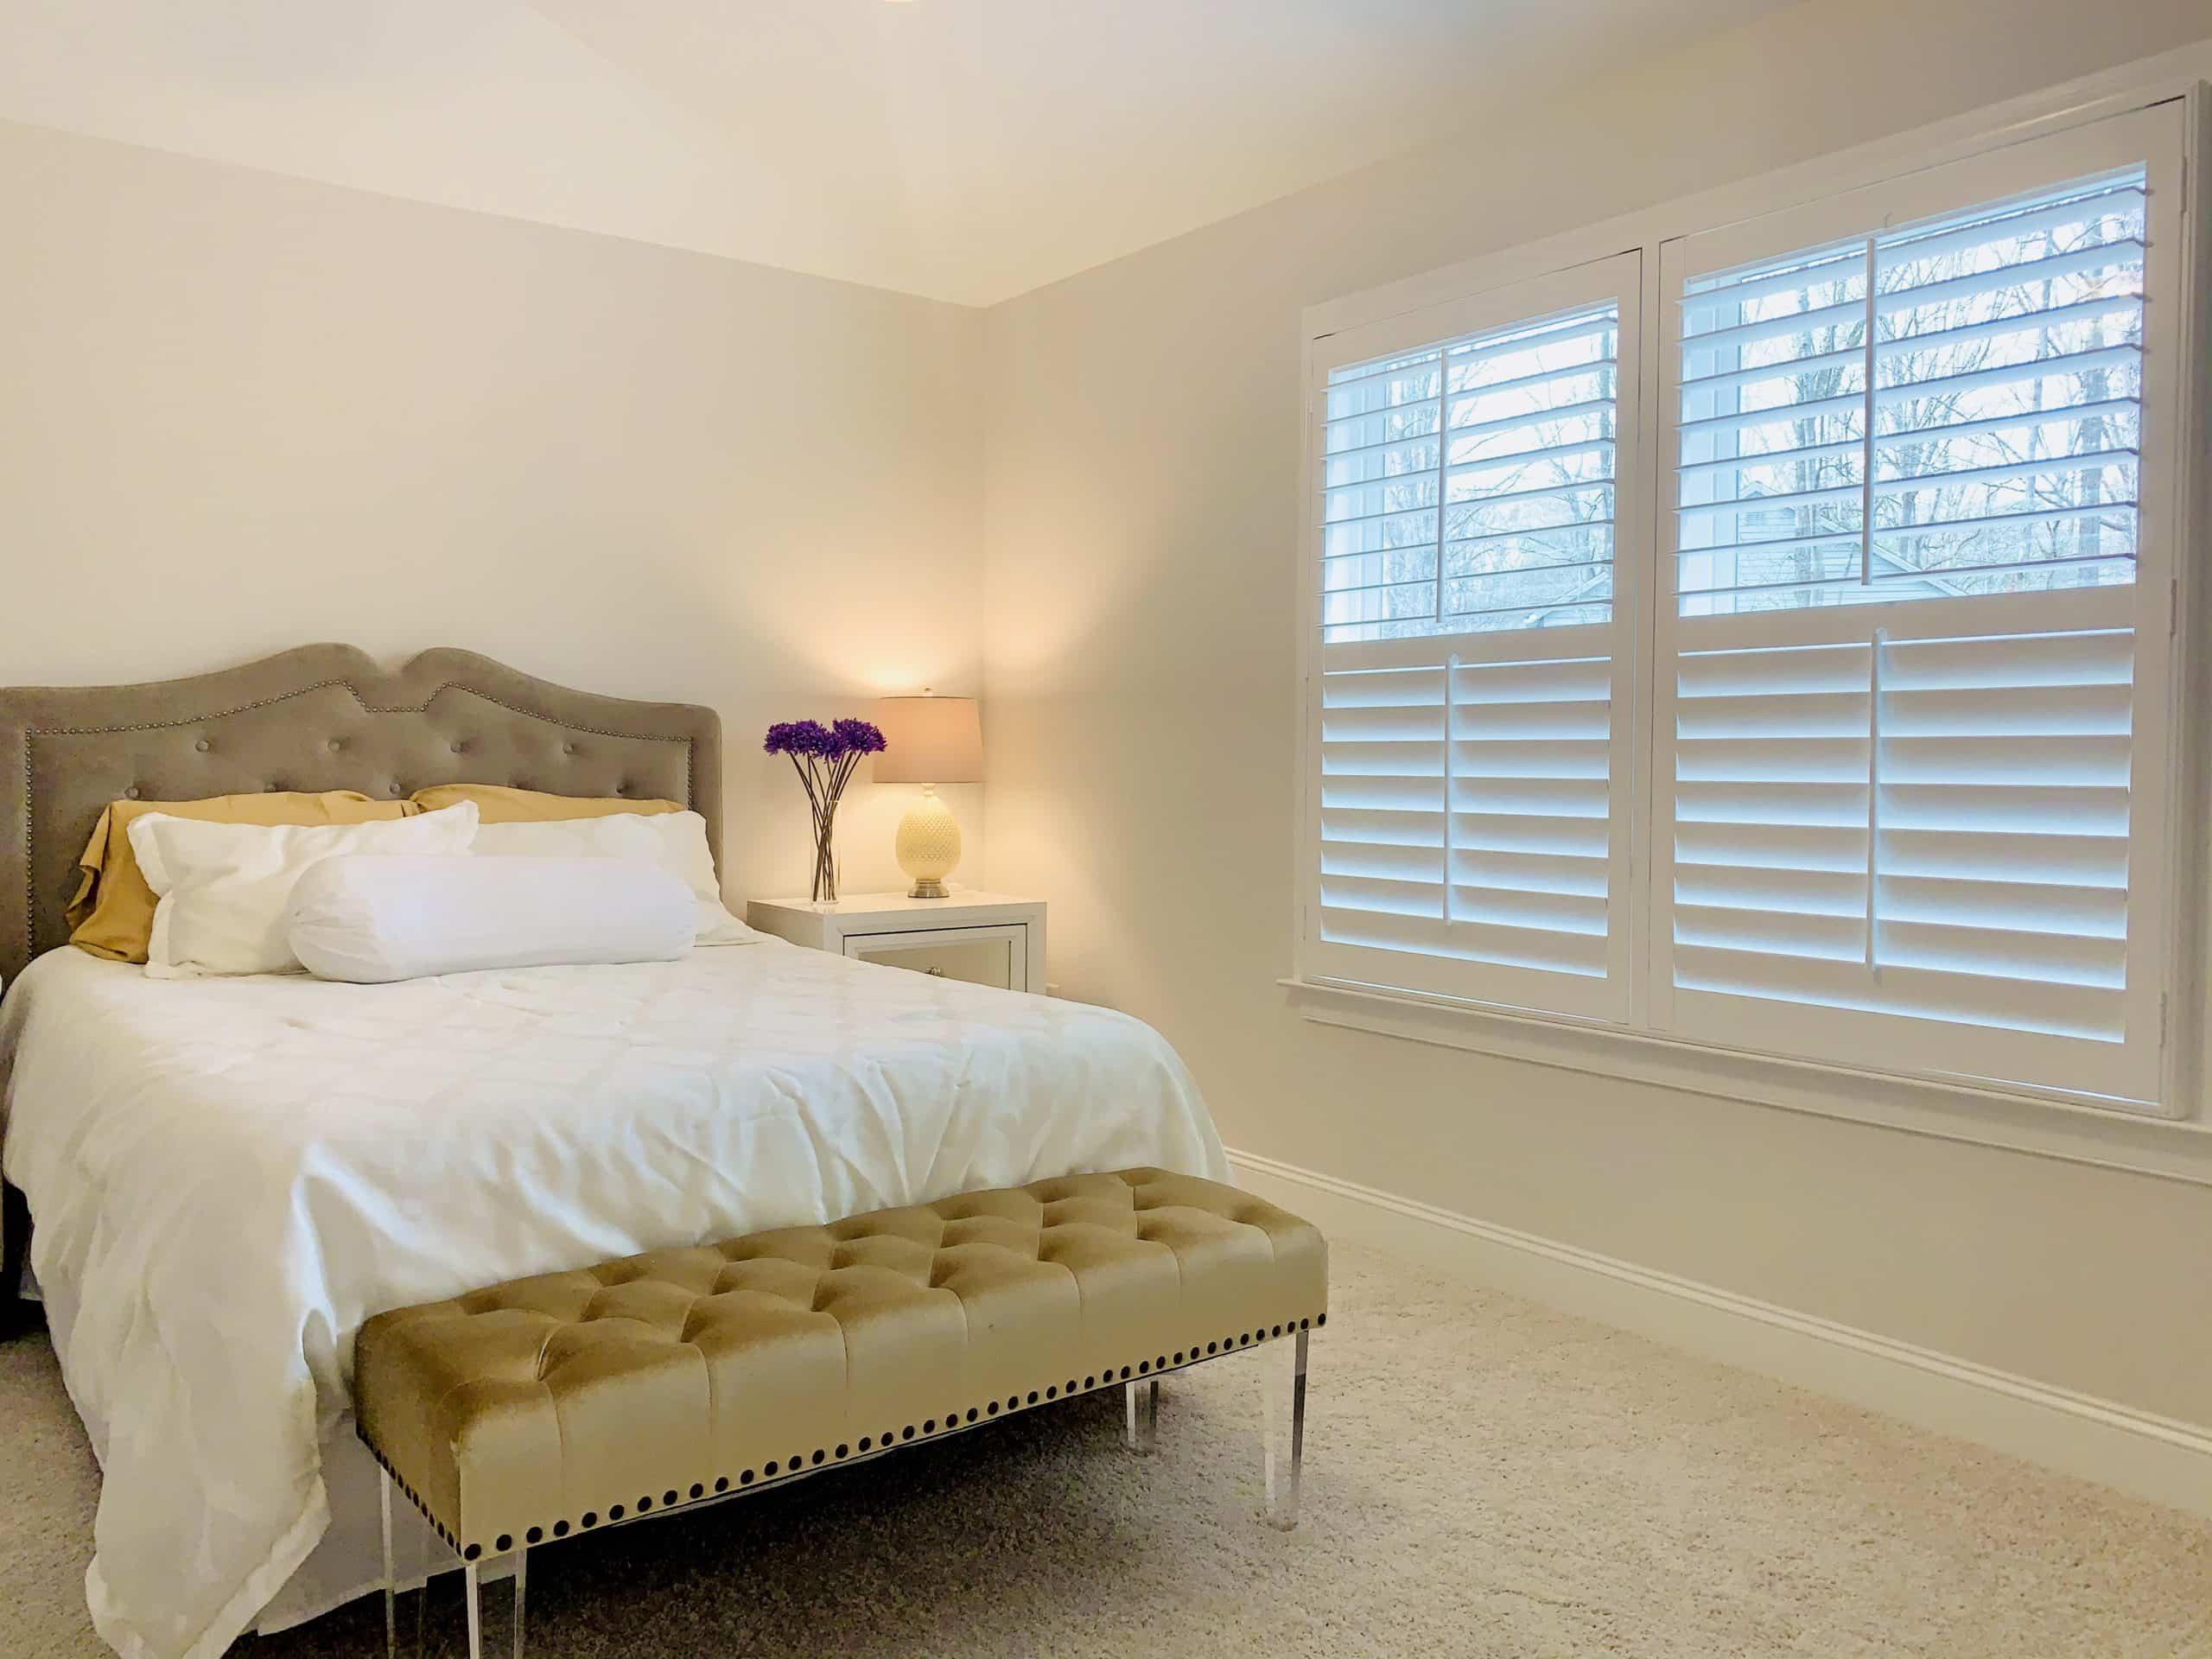 interior_shutters_bedroom